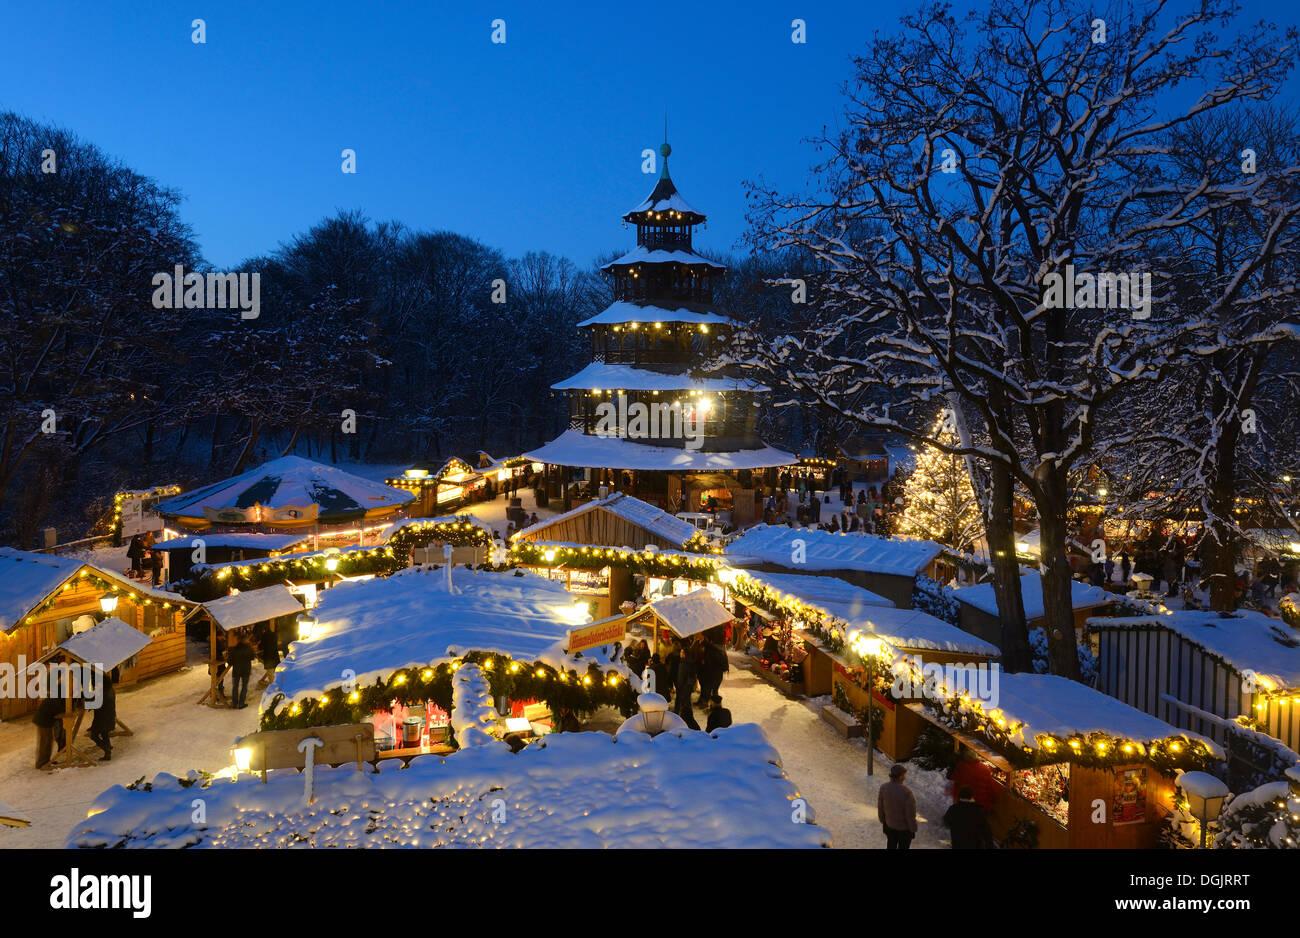 Christmas market at the Chinese Tower, English Gardens, Munich, Upper Bavaria, Bavaria, Germany - Stock Image